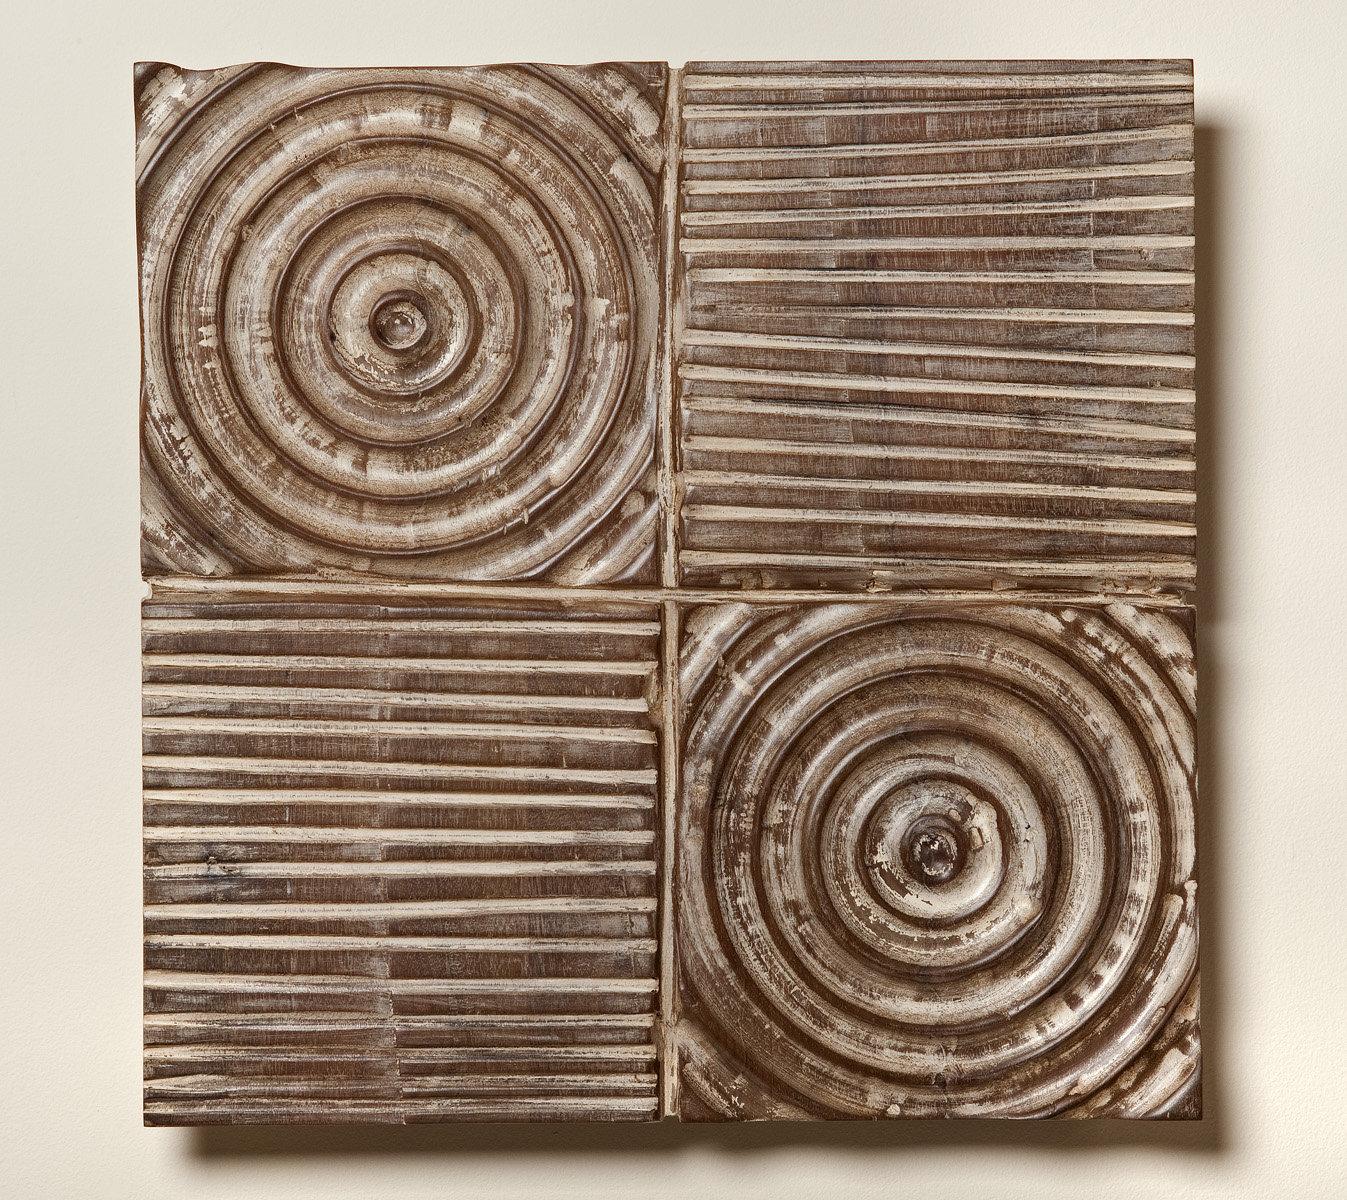 Wall Art In Wood : Quadrant by kipley meyer wood wall art artful home